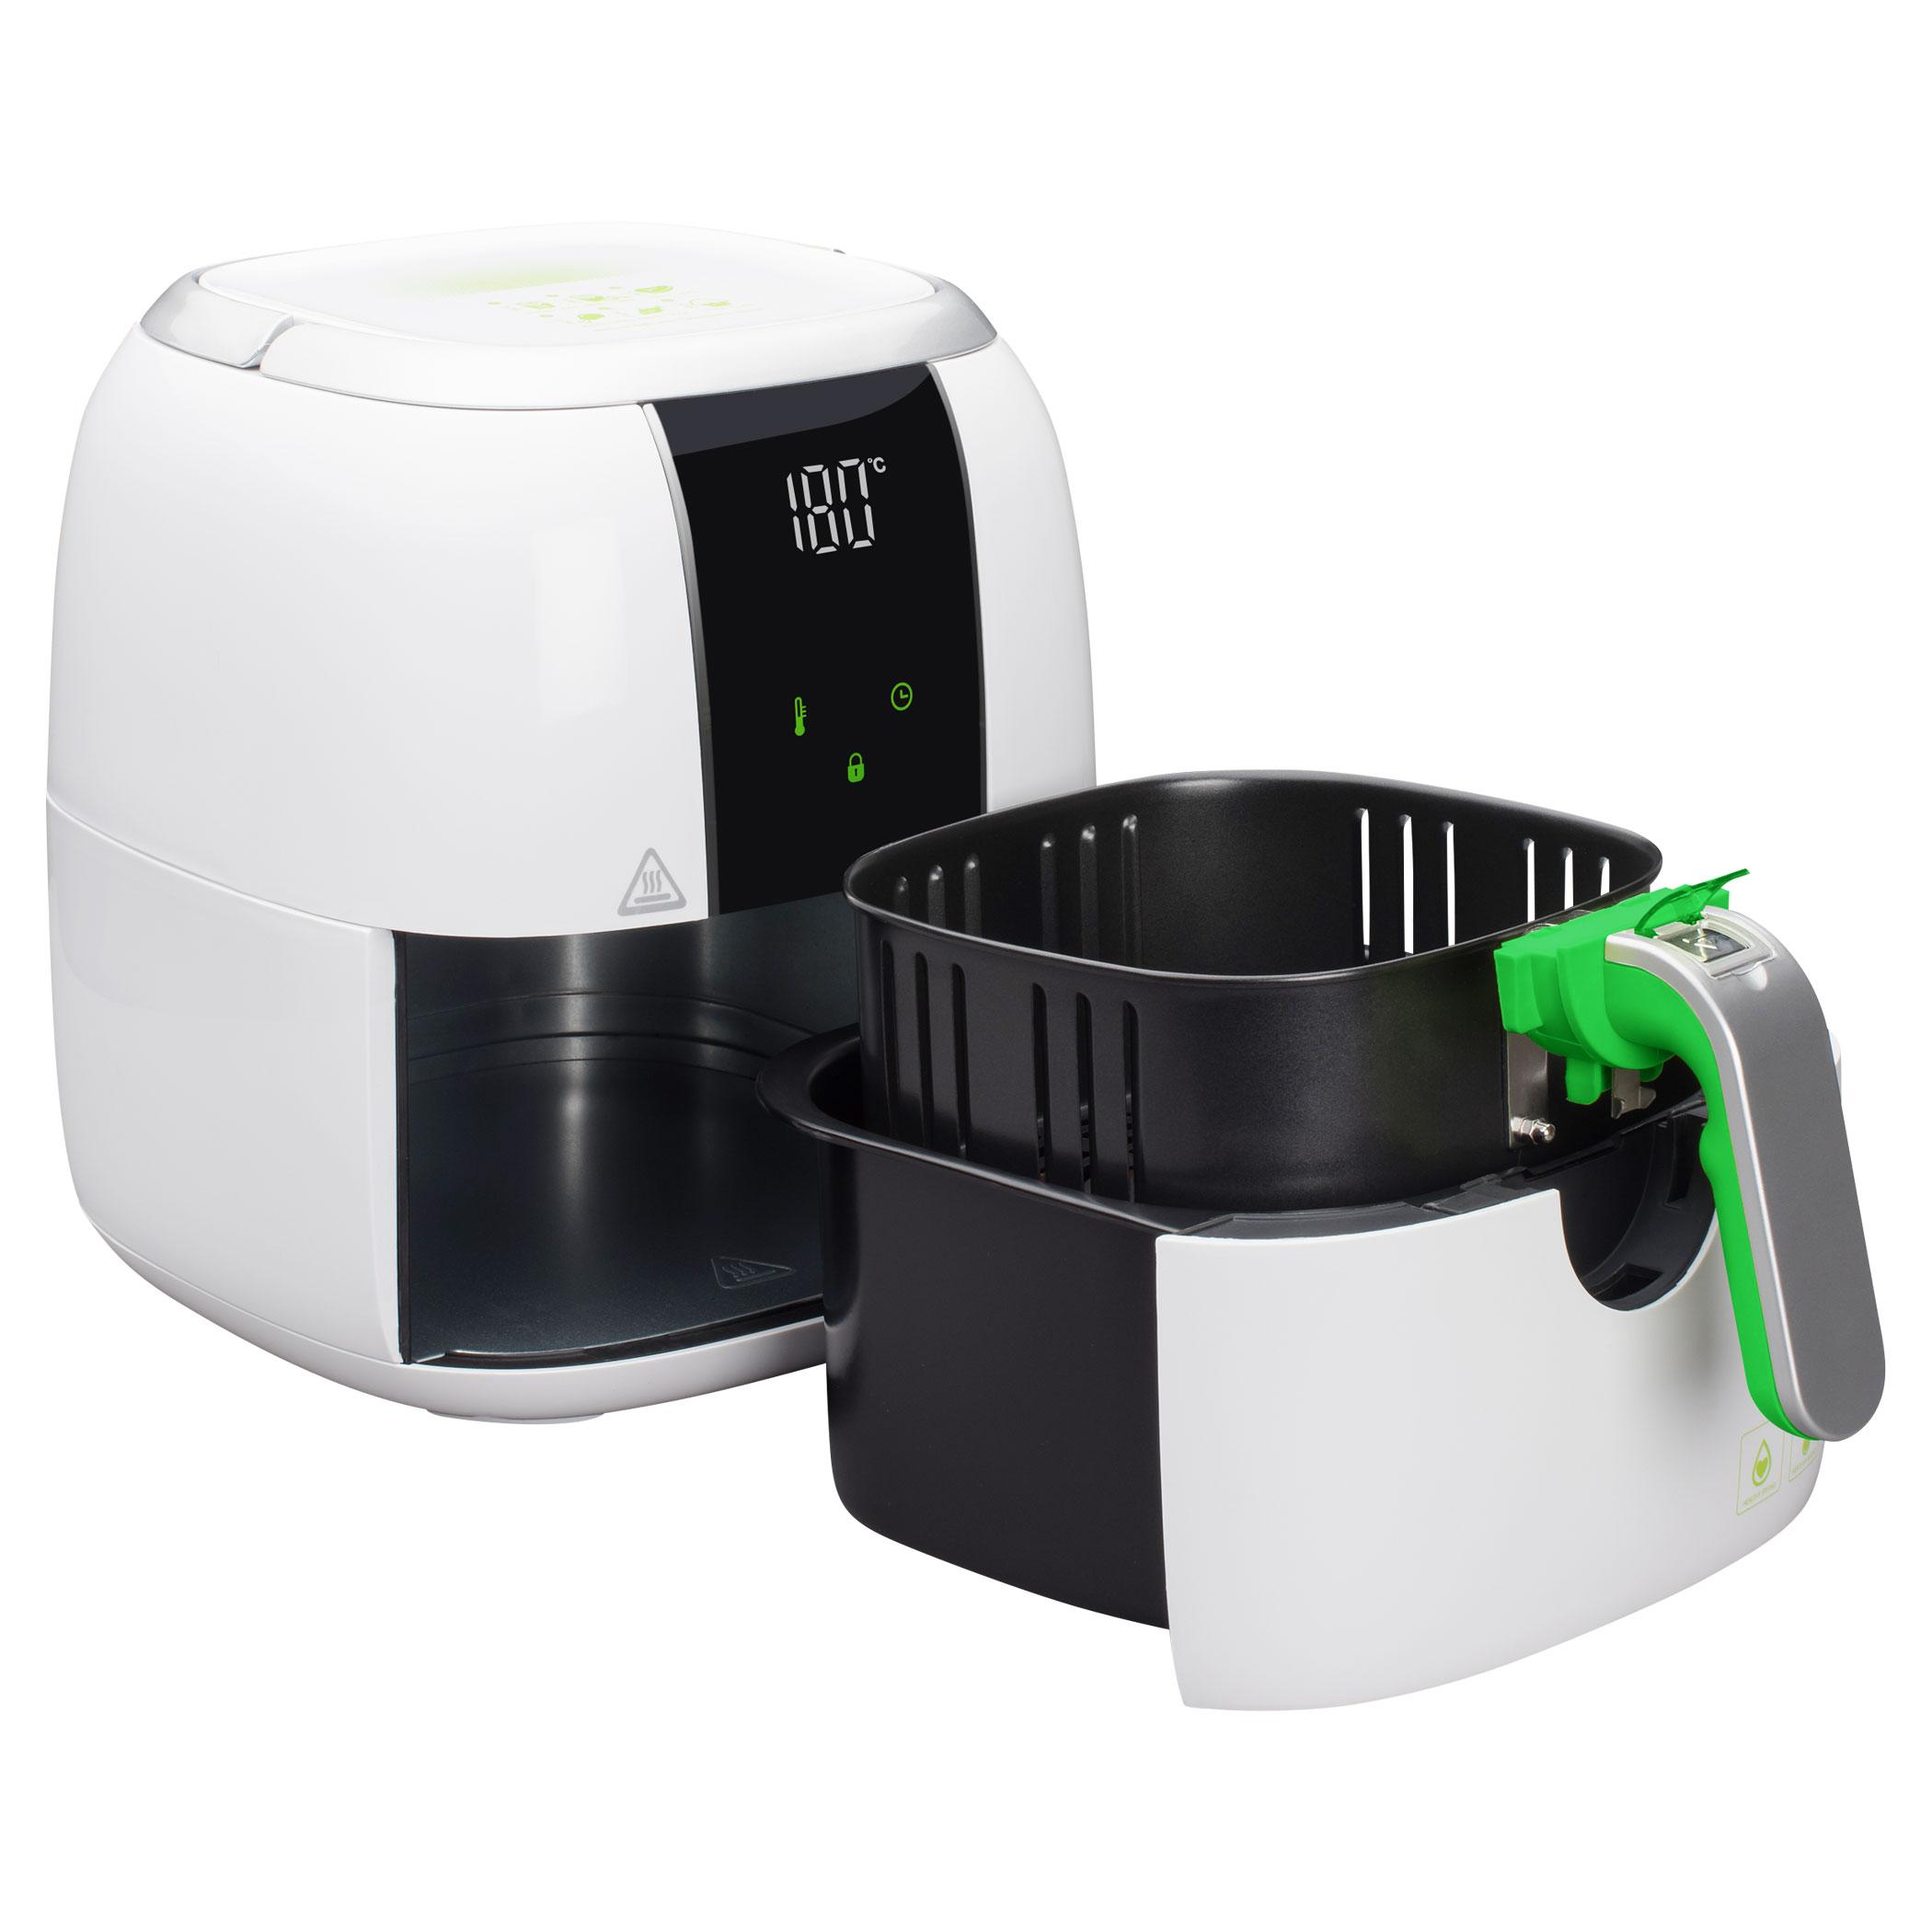 Sencor Vita Air Fryer Digital Display SFR5320WH-1400W